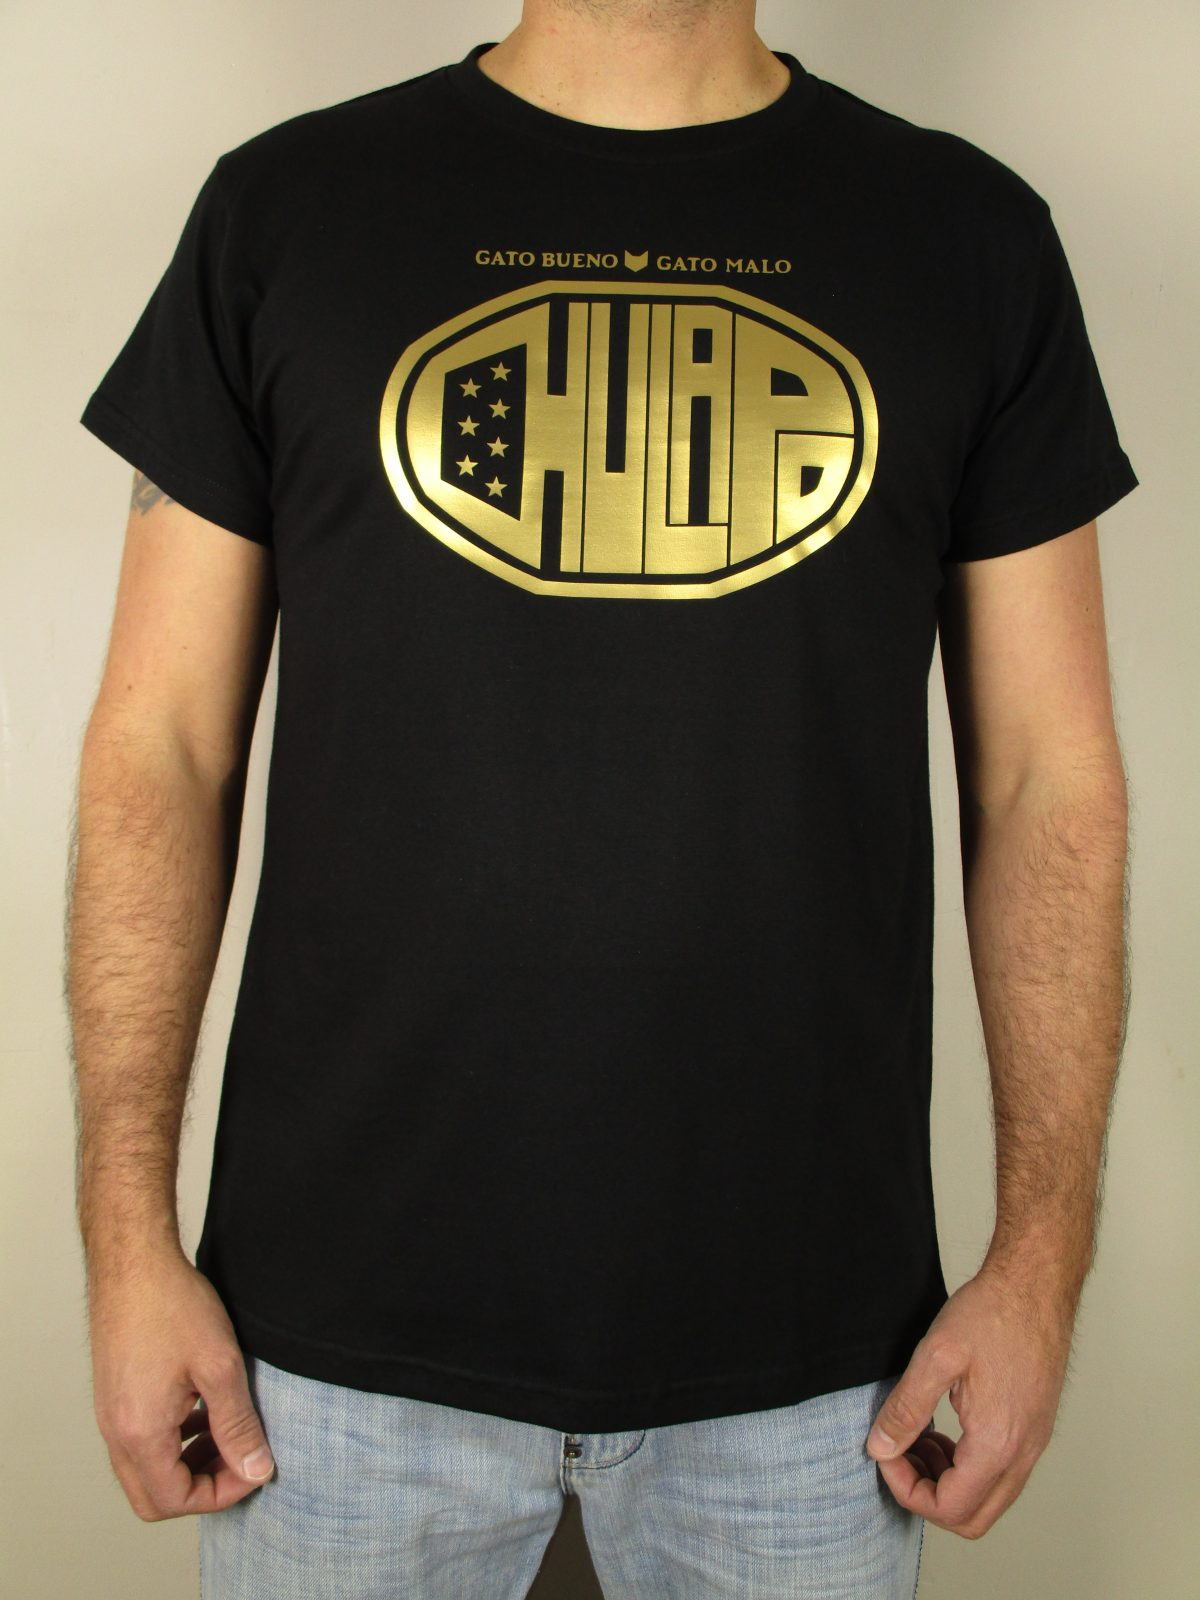 Chulapo camiseta negra hecha en España oro dorado Gato bueno gato malo calidad camiseta original personal la mejor harapos Madrid madrileño